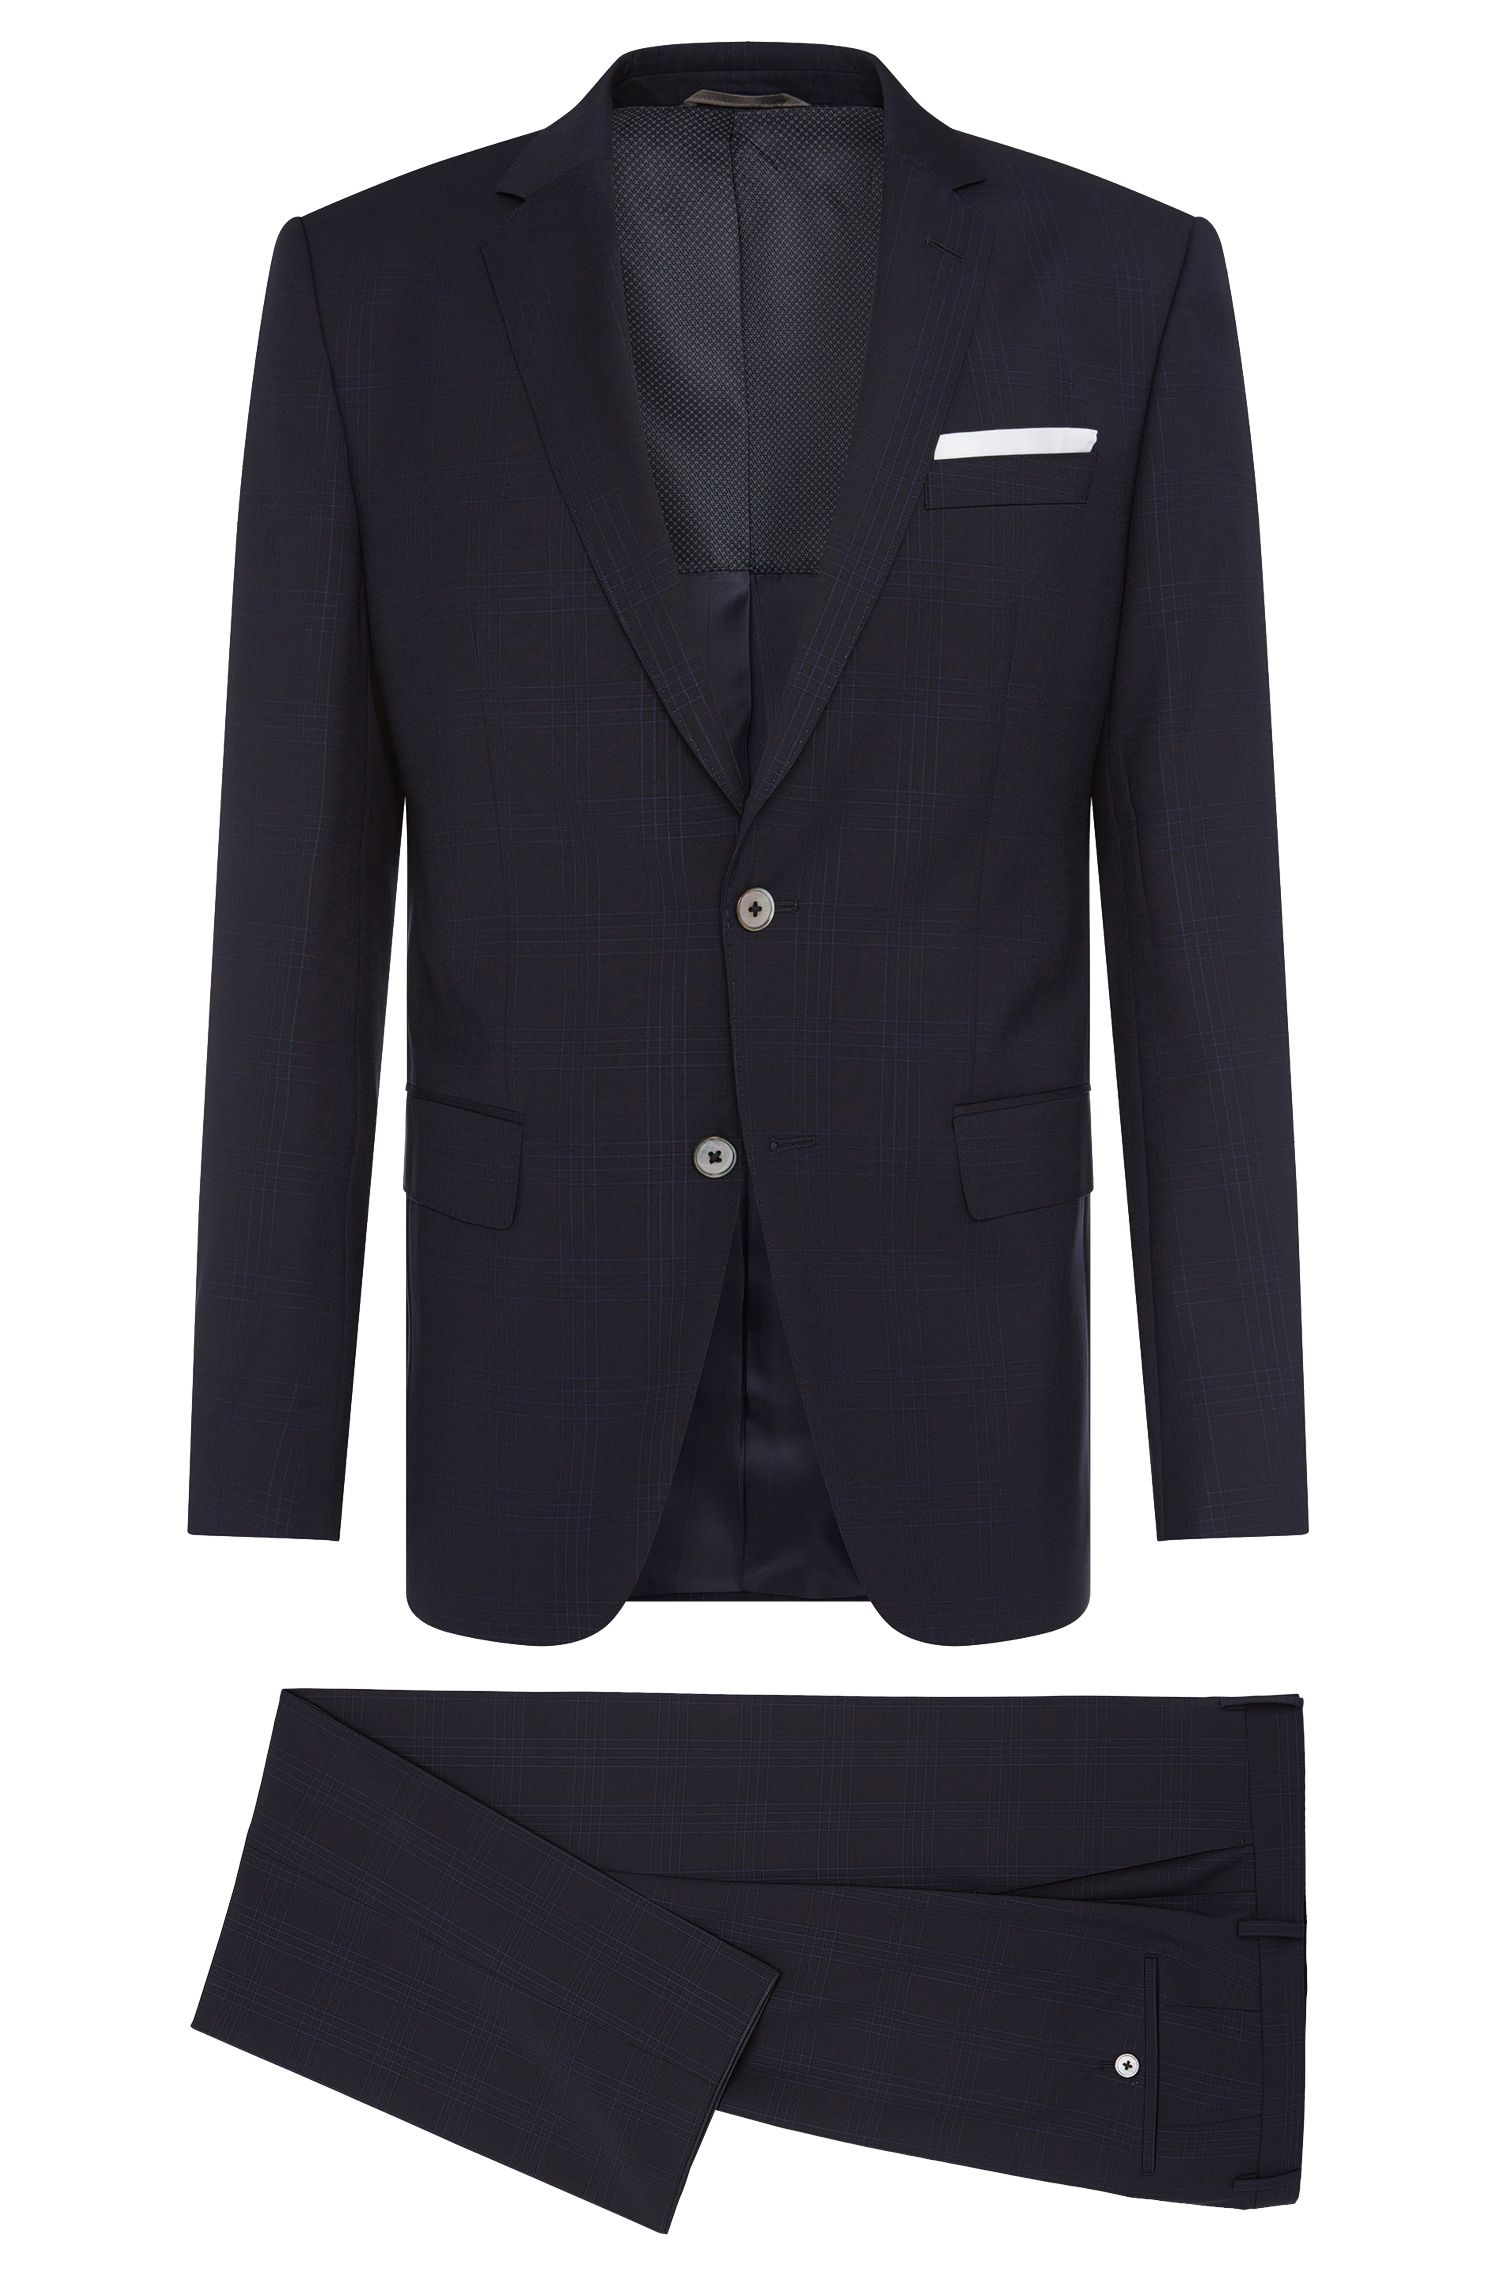 'Hutson/Gander' | Slim Fit, Italian Super 110 Virgin Wool Suit